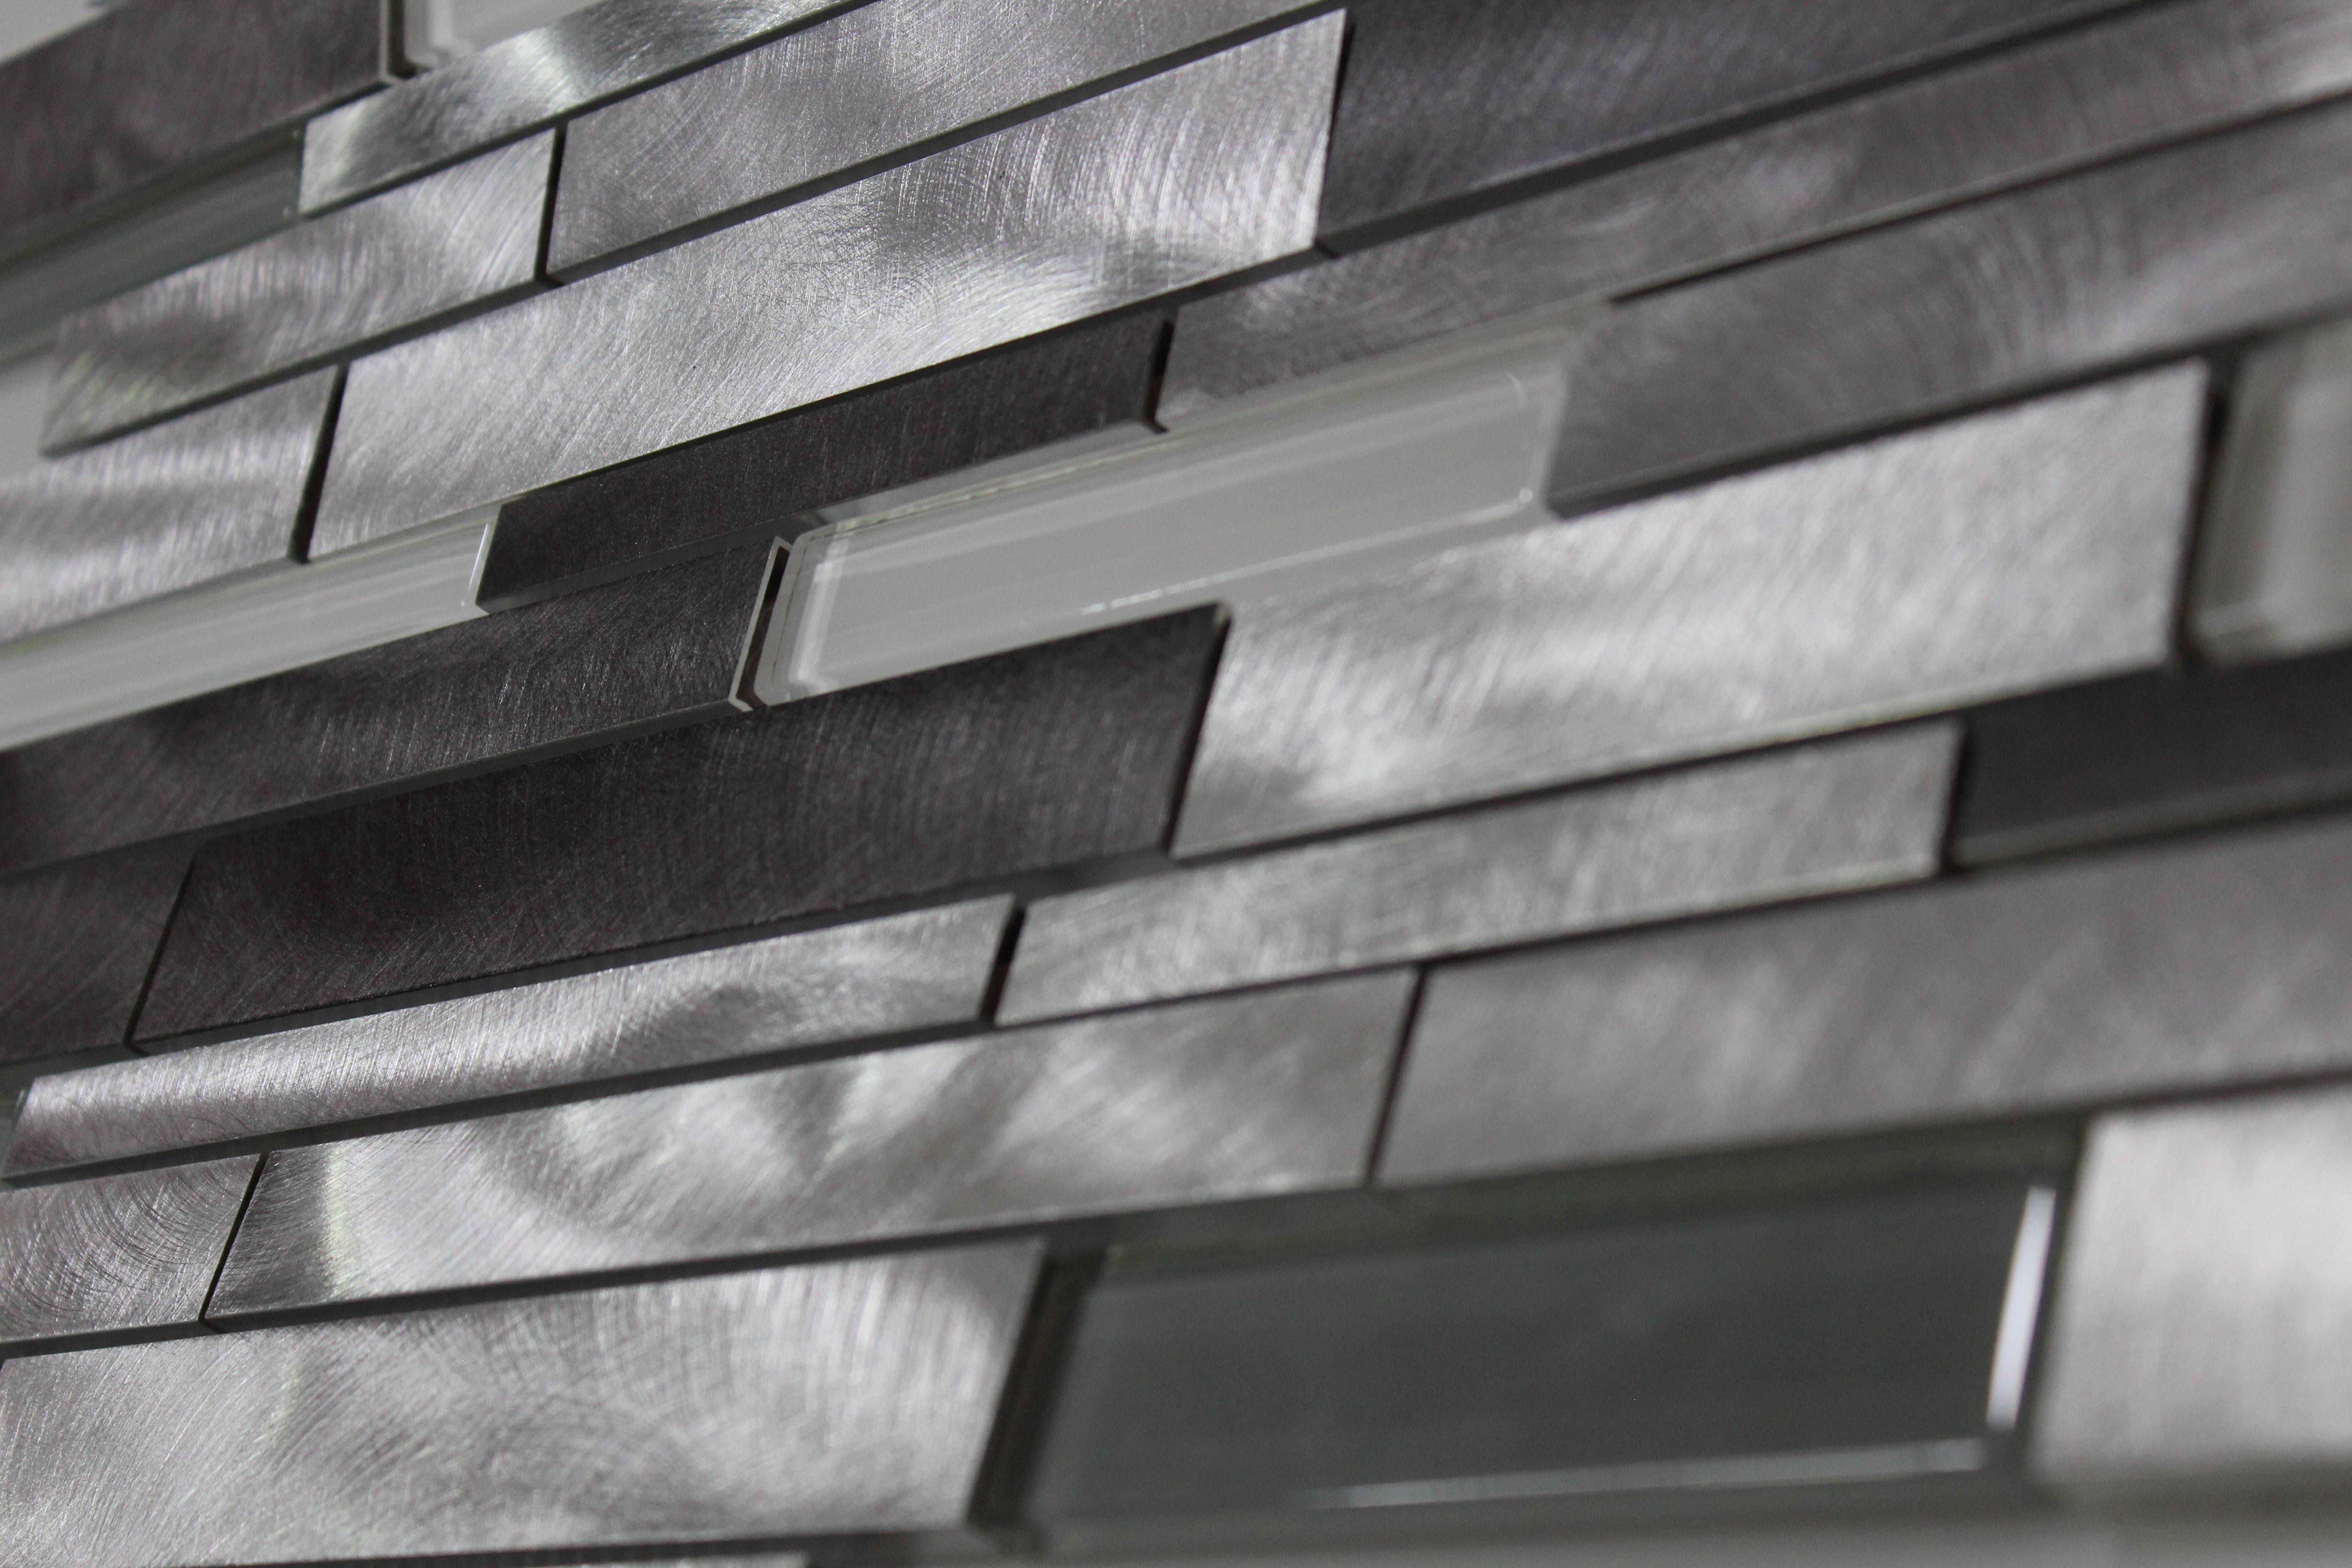 Glass Mosaic / 14 x 12 x 0.31 inches / Glossy Interlocking Random Sized Glass & Aluminum Mosaic Tile In Gray 0